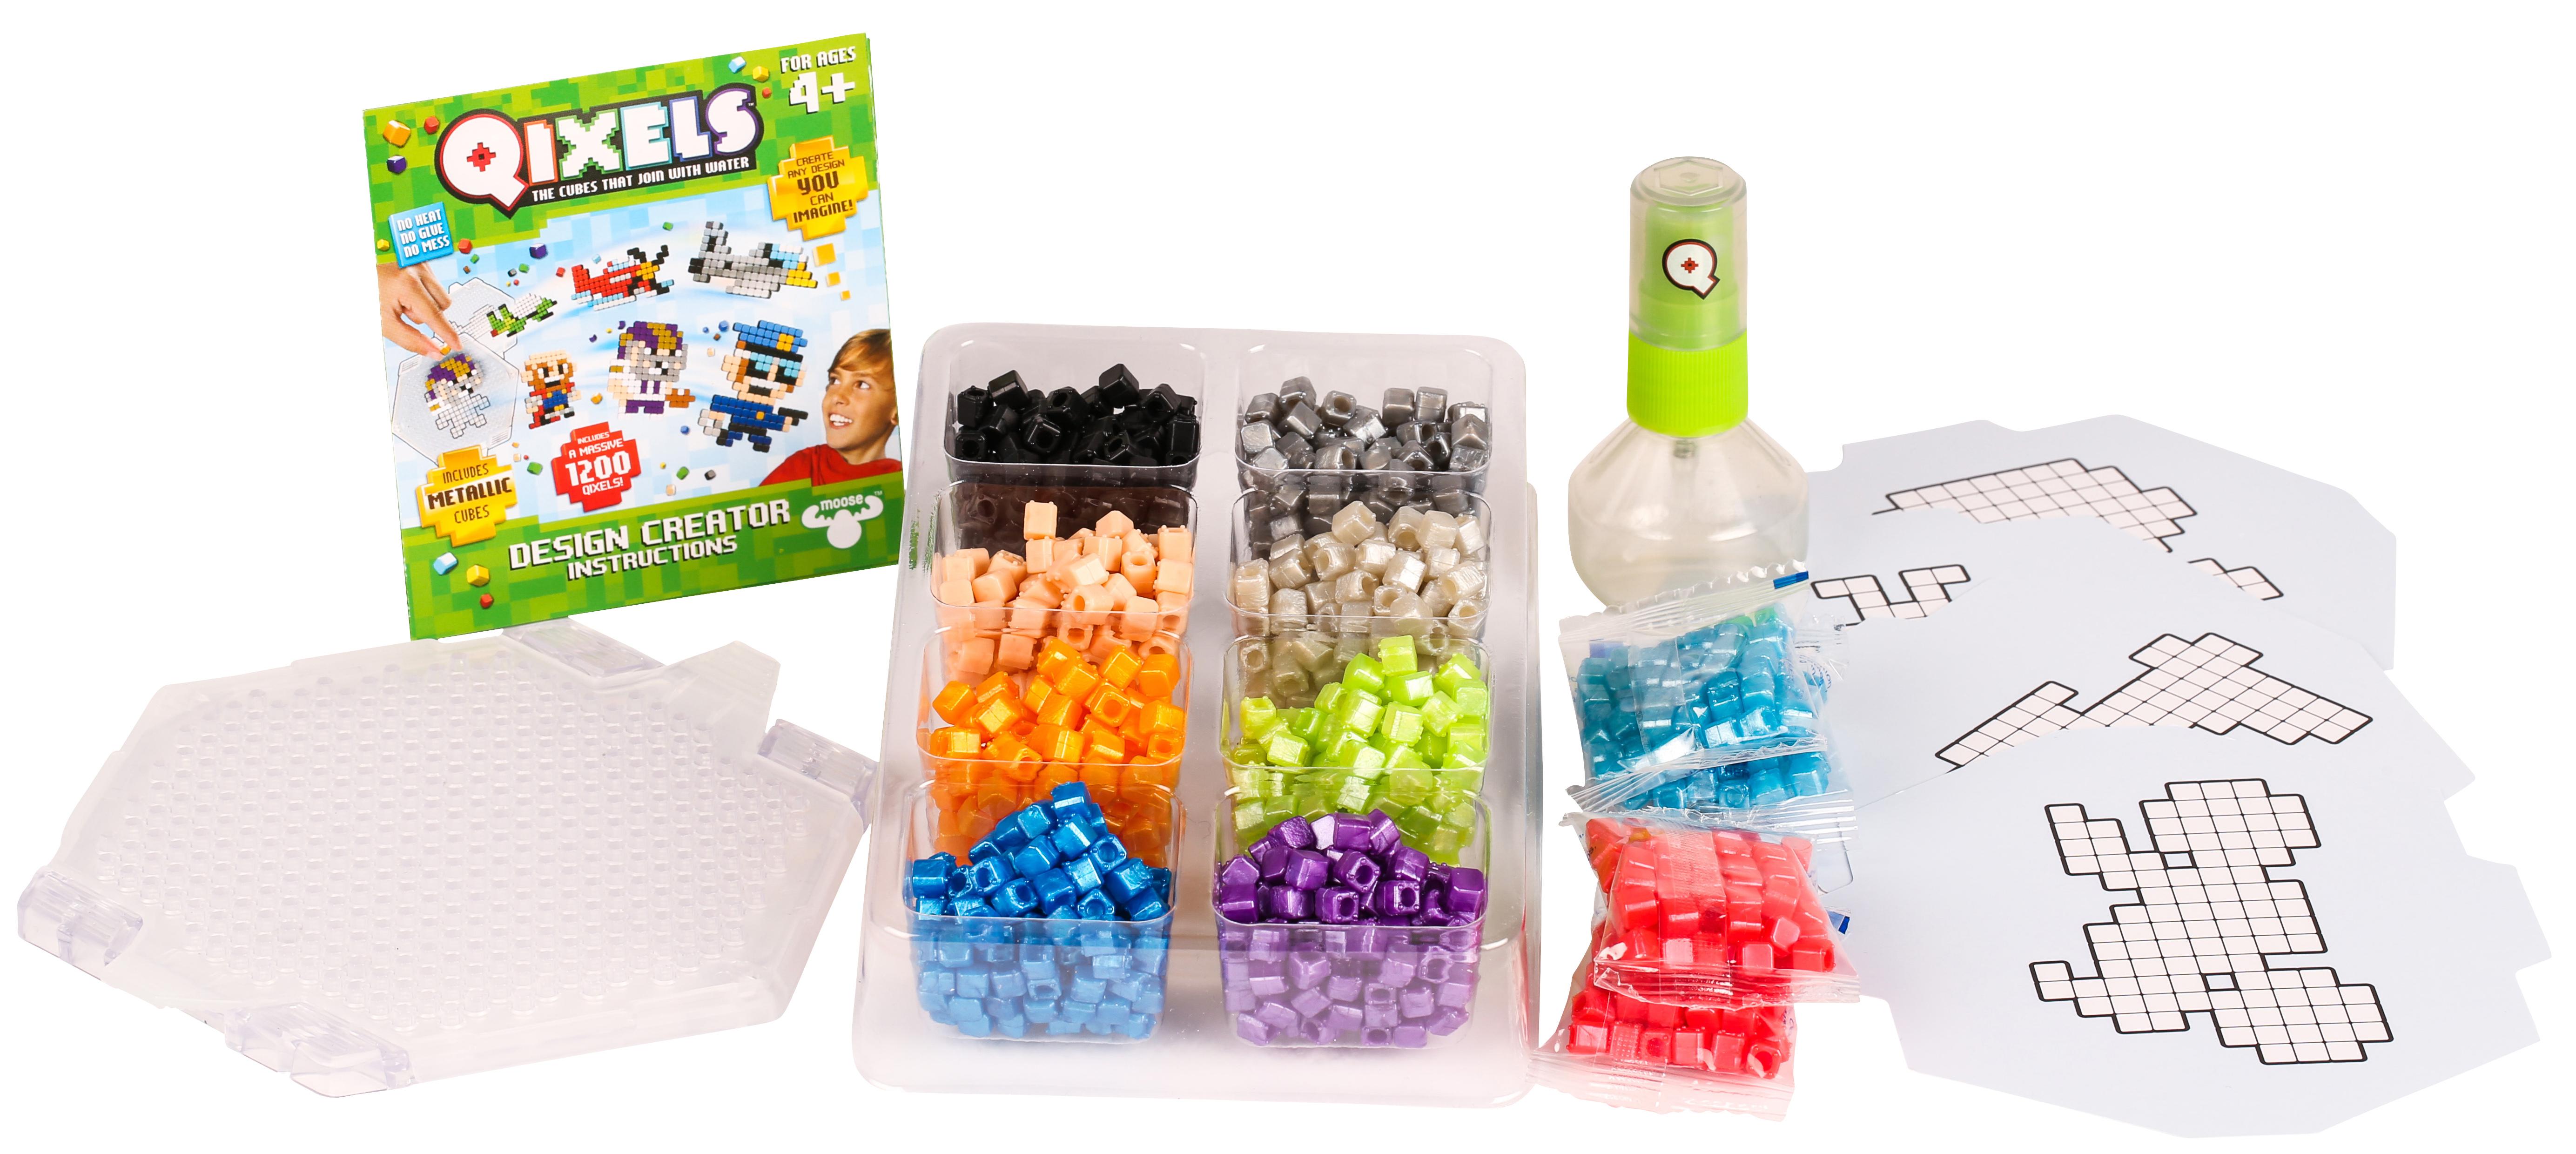 Наборы для творчества Qixels Набор для творчества Qixels «Дизайнер» набор для творчества qixels ледяные воины